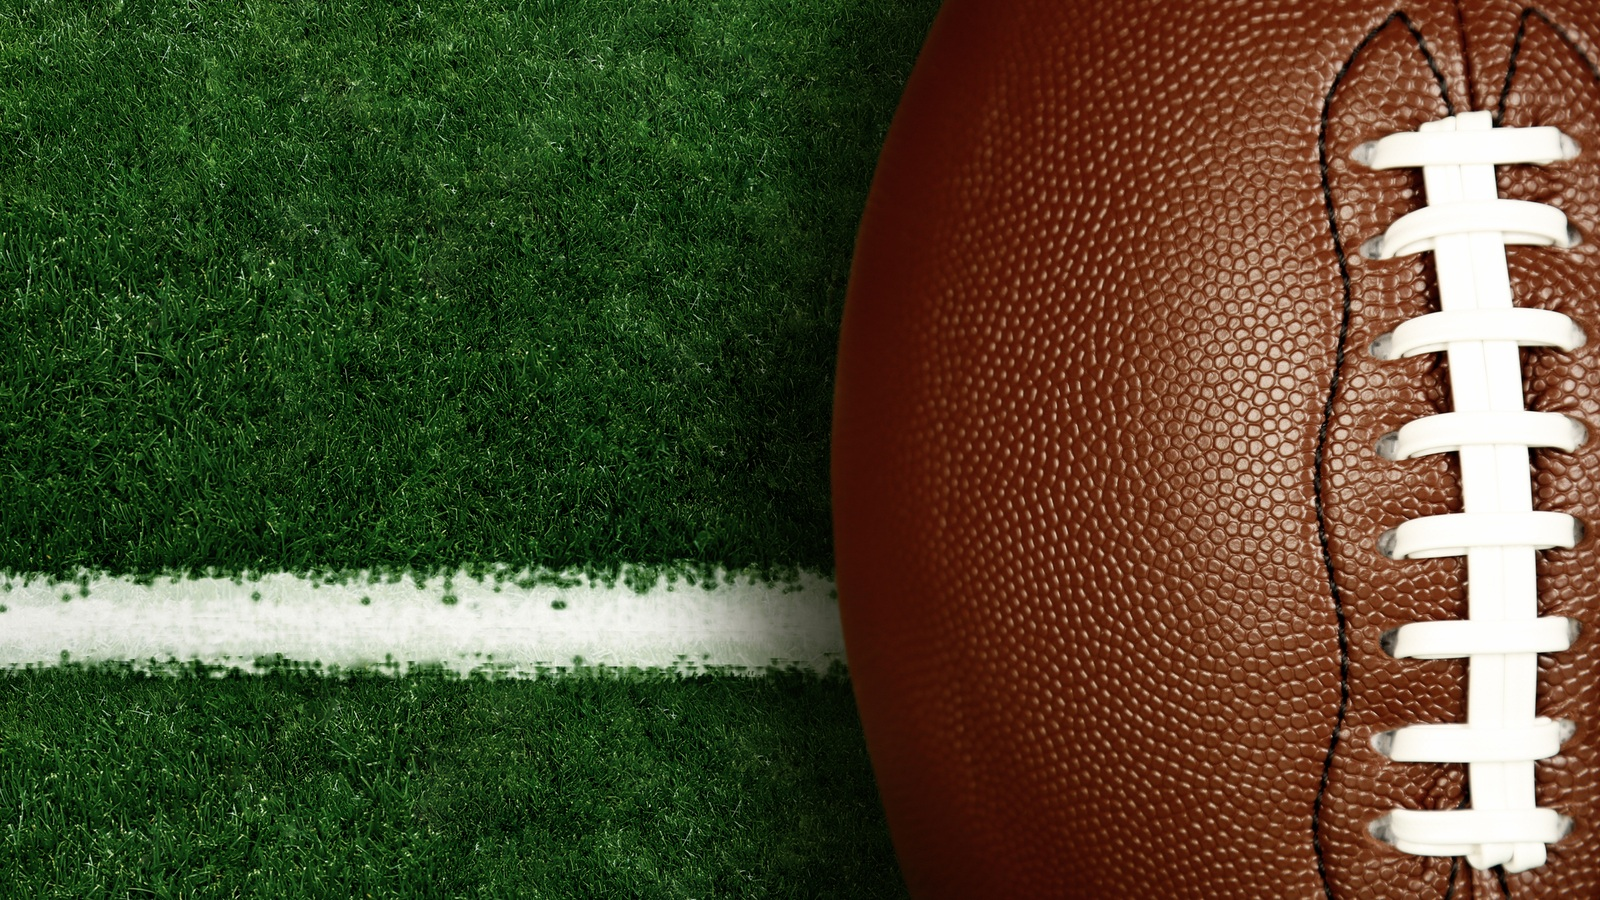 bigstock-American-football-on-football--132369737.jpg